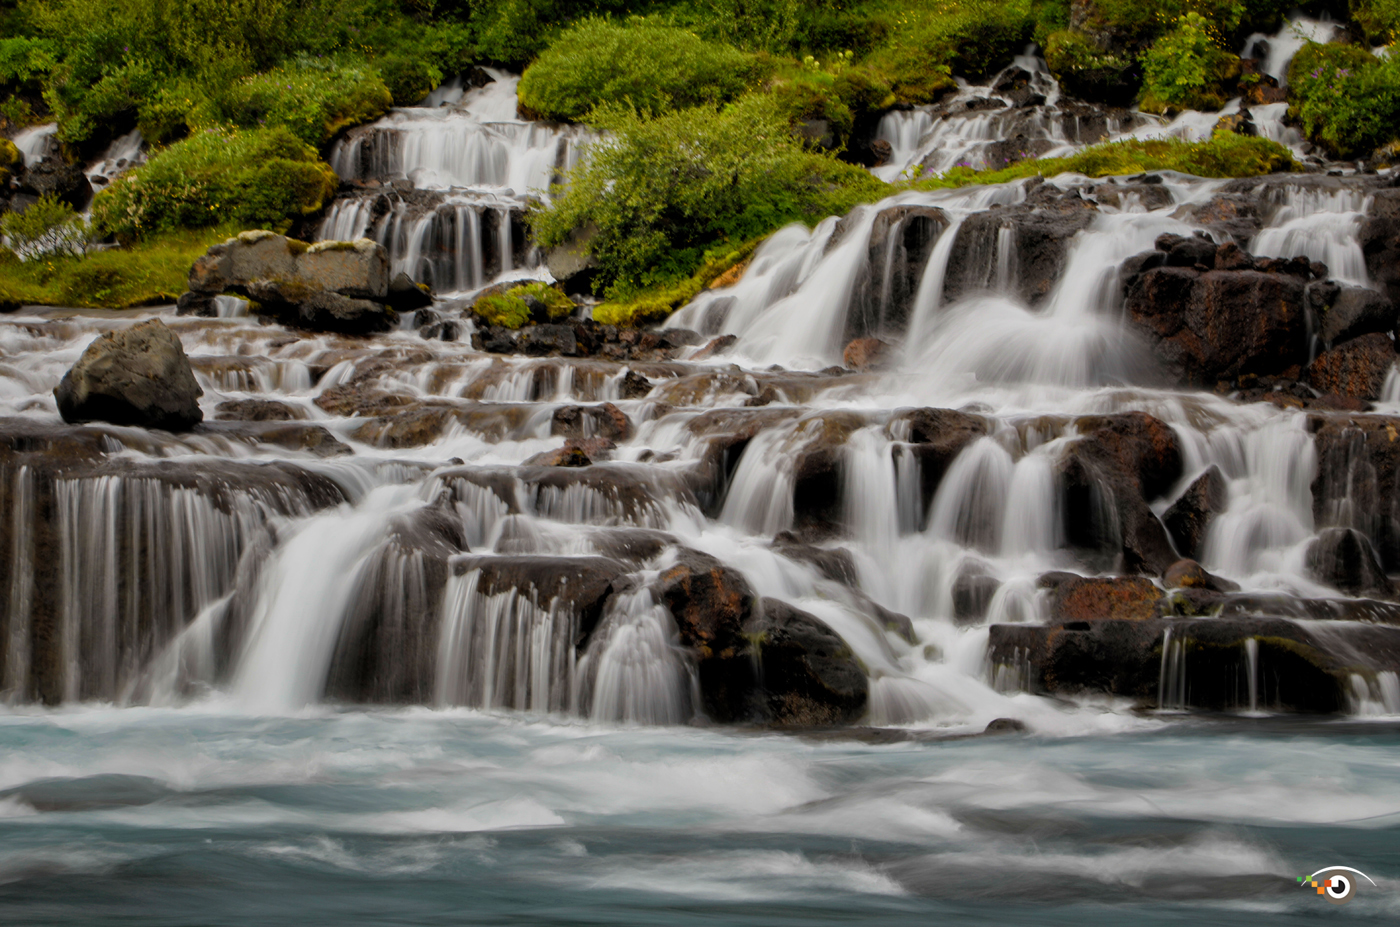 Rick Sammon Iceland 15.jpg